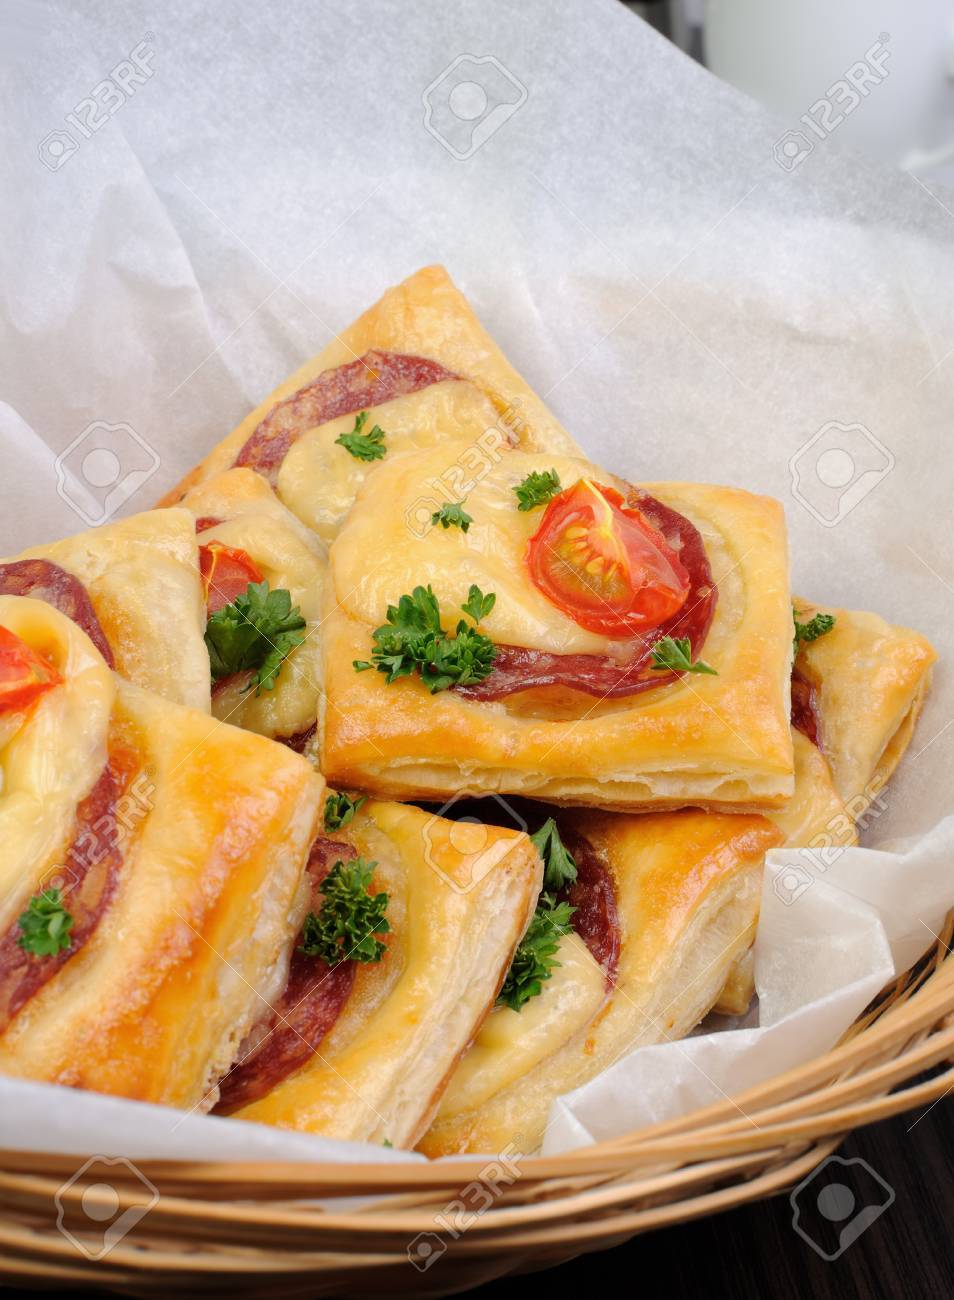 apéritif de pâte feuilletée avec salami, fromage et tomates cerises